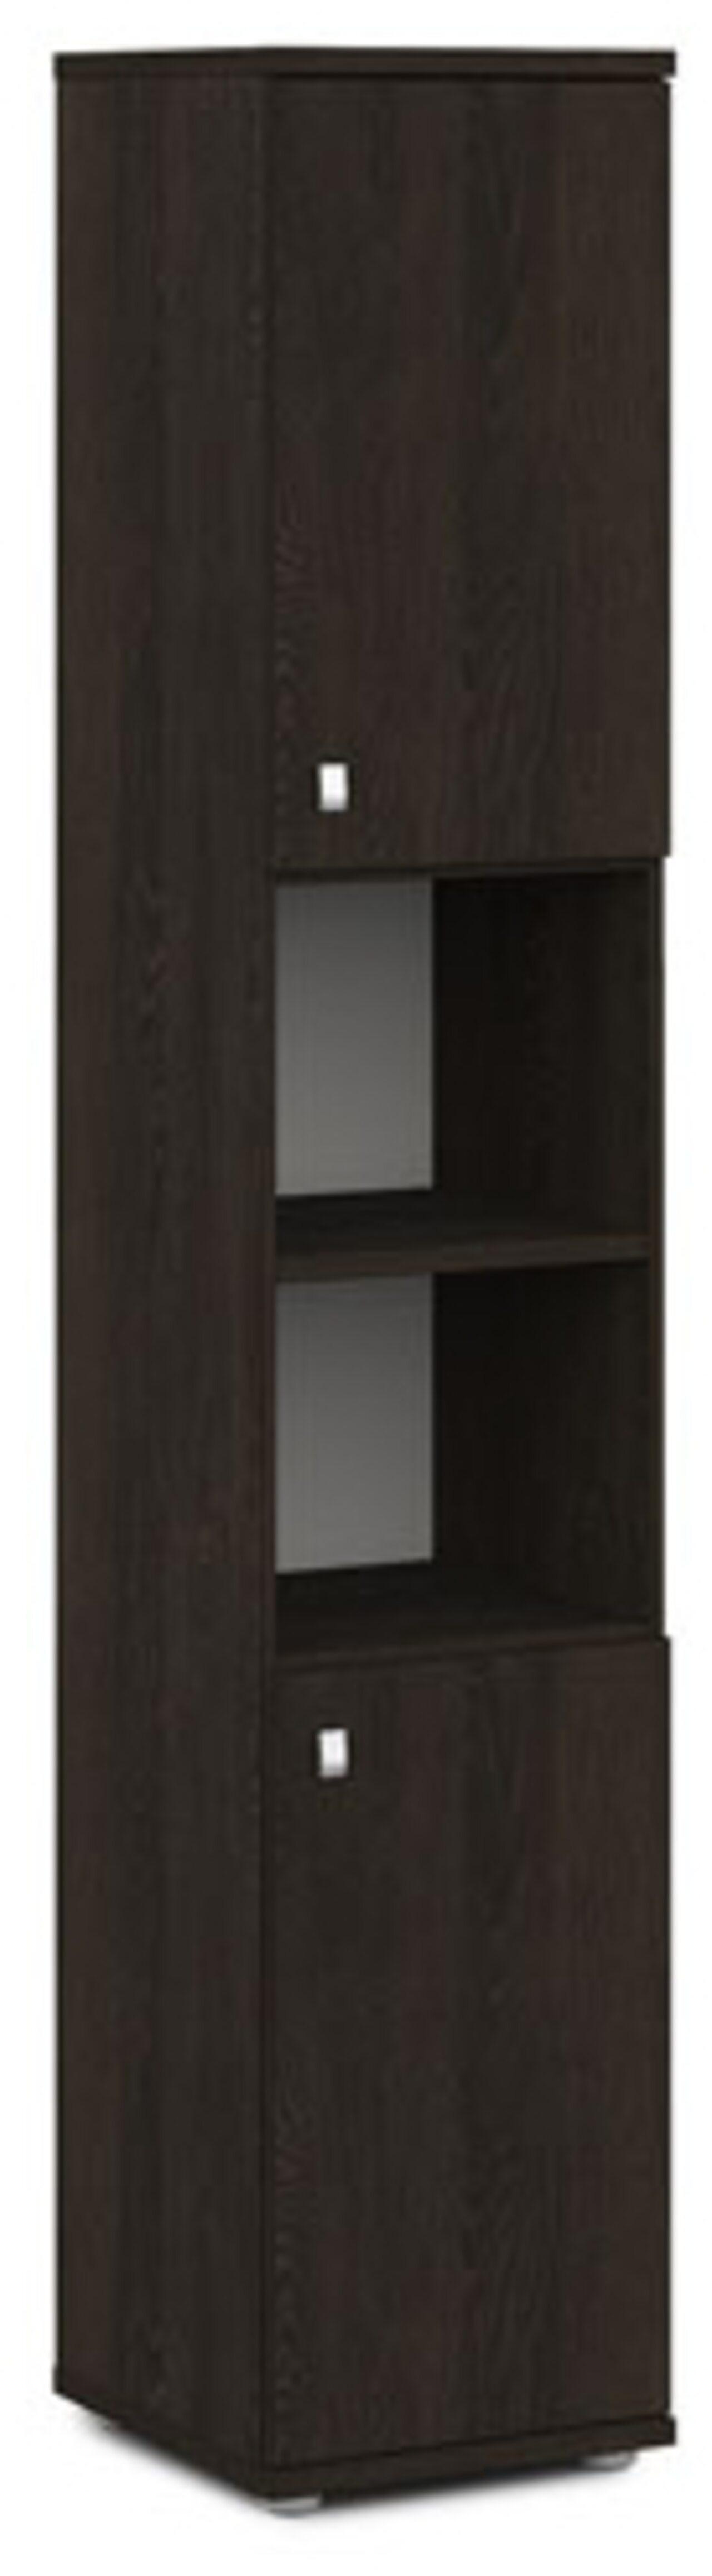 Шкаф закрытый  Vasanta 42x44x220 - фото 1